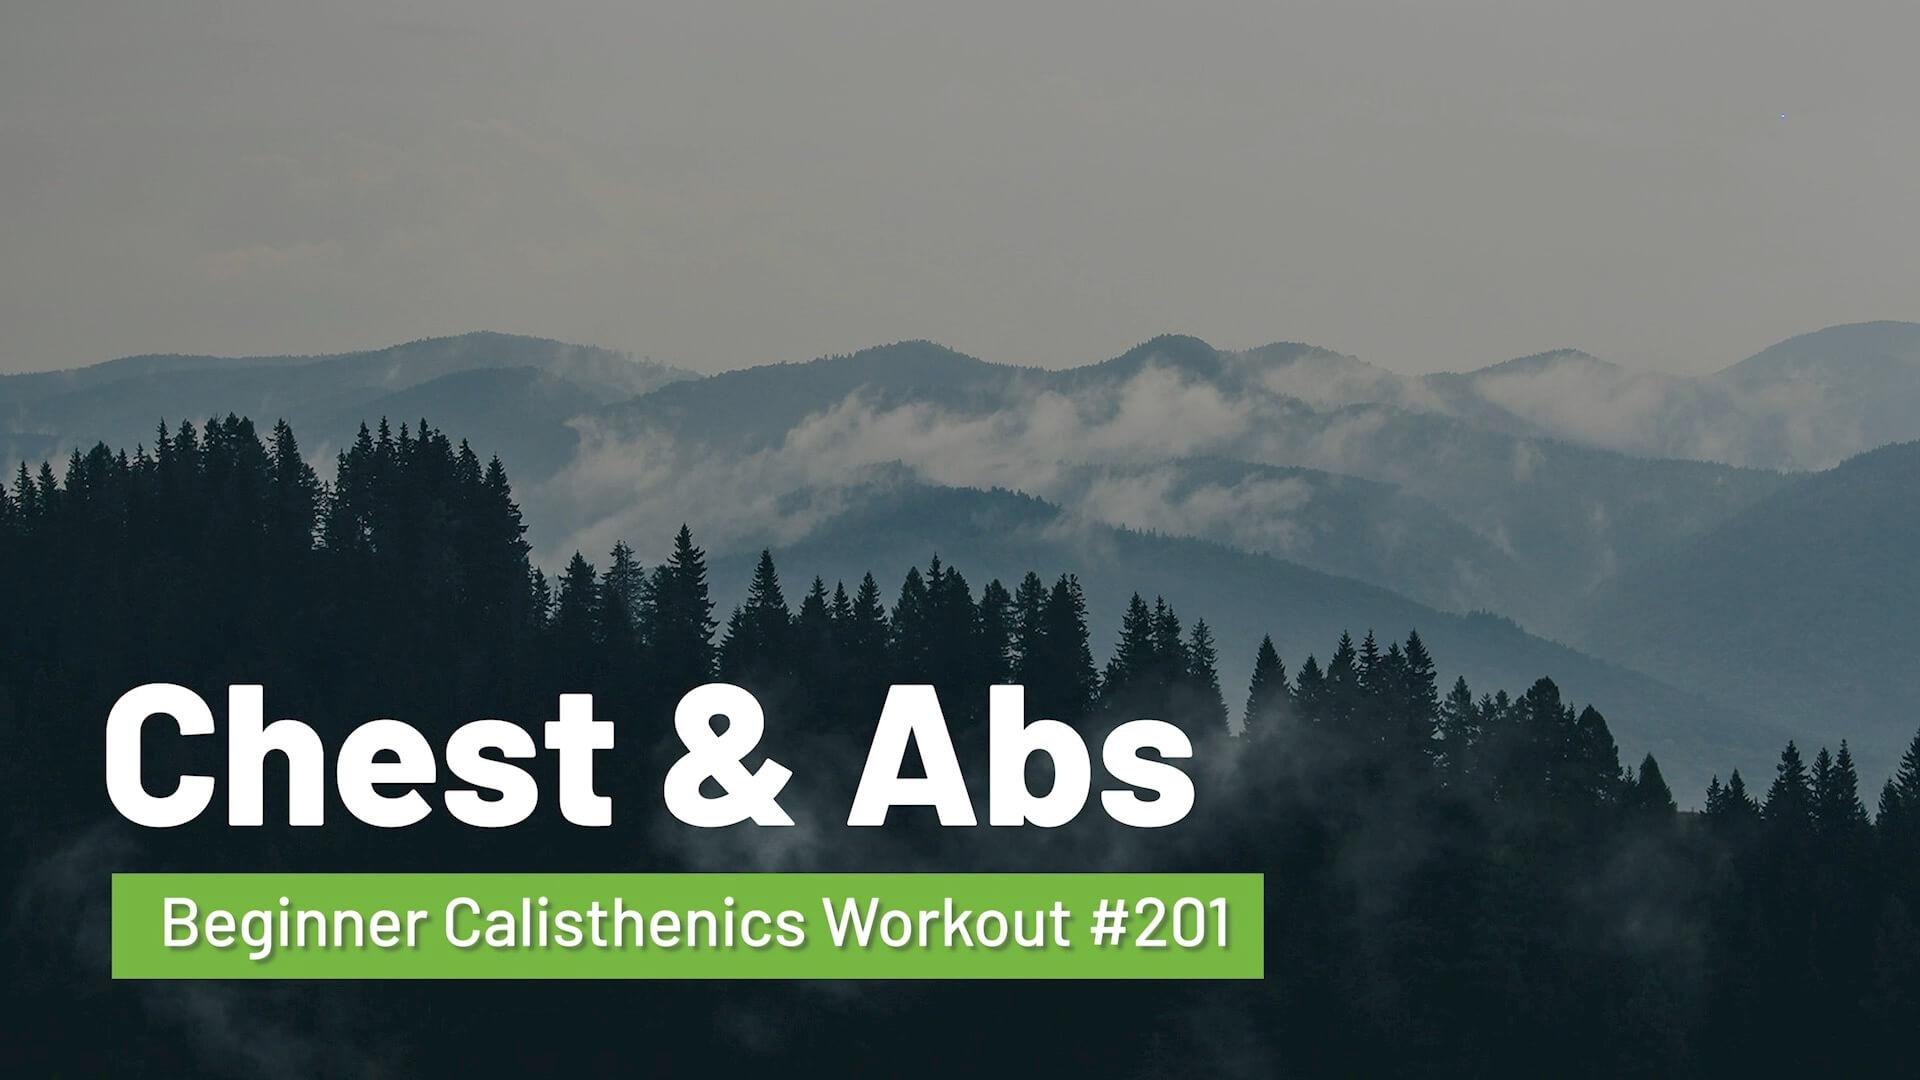 Workout #201